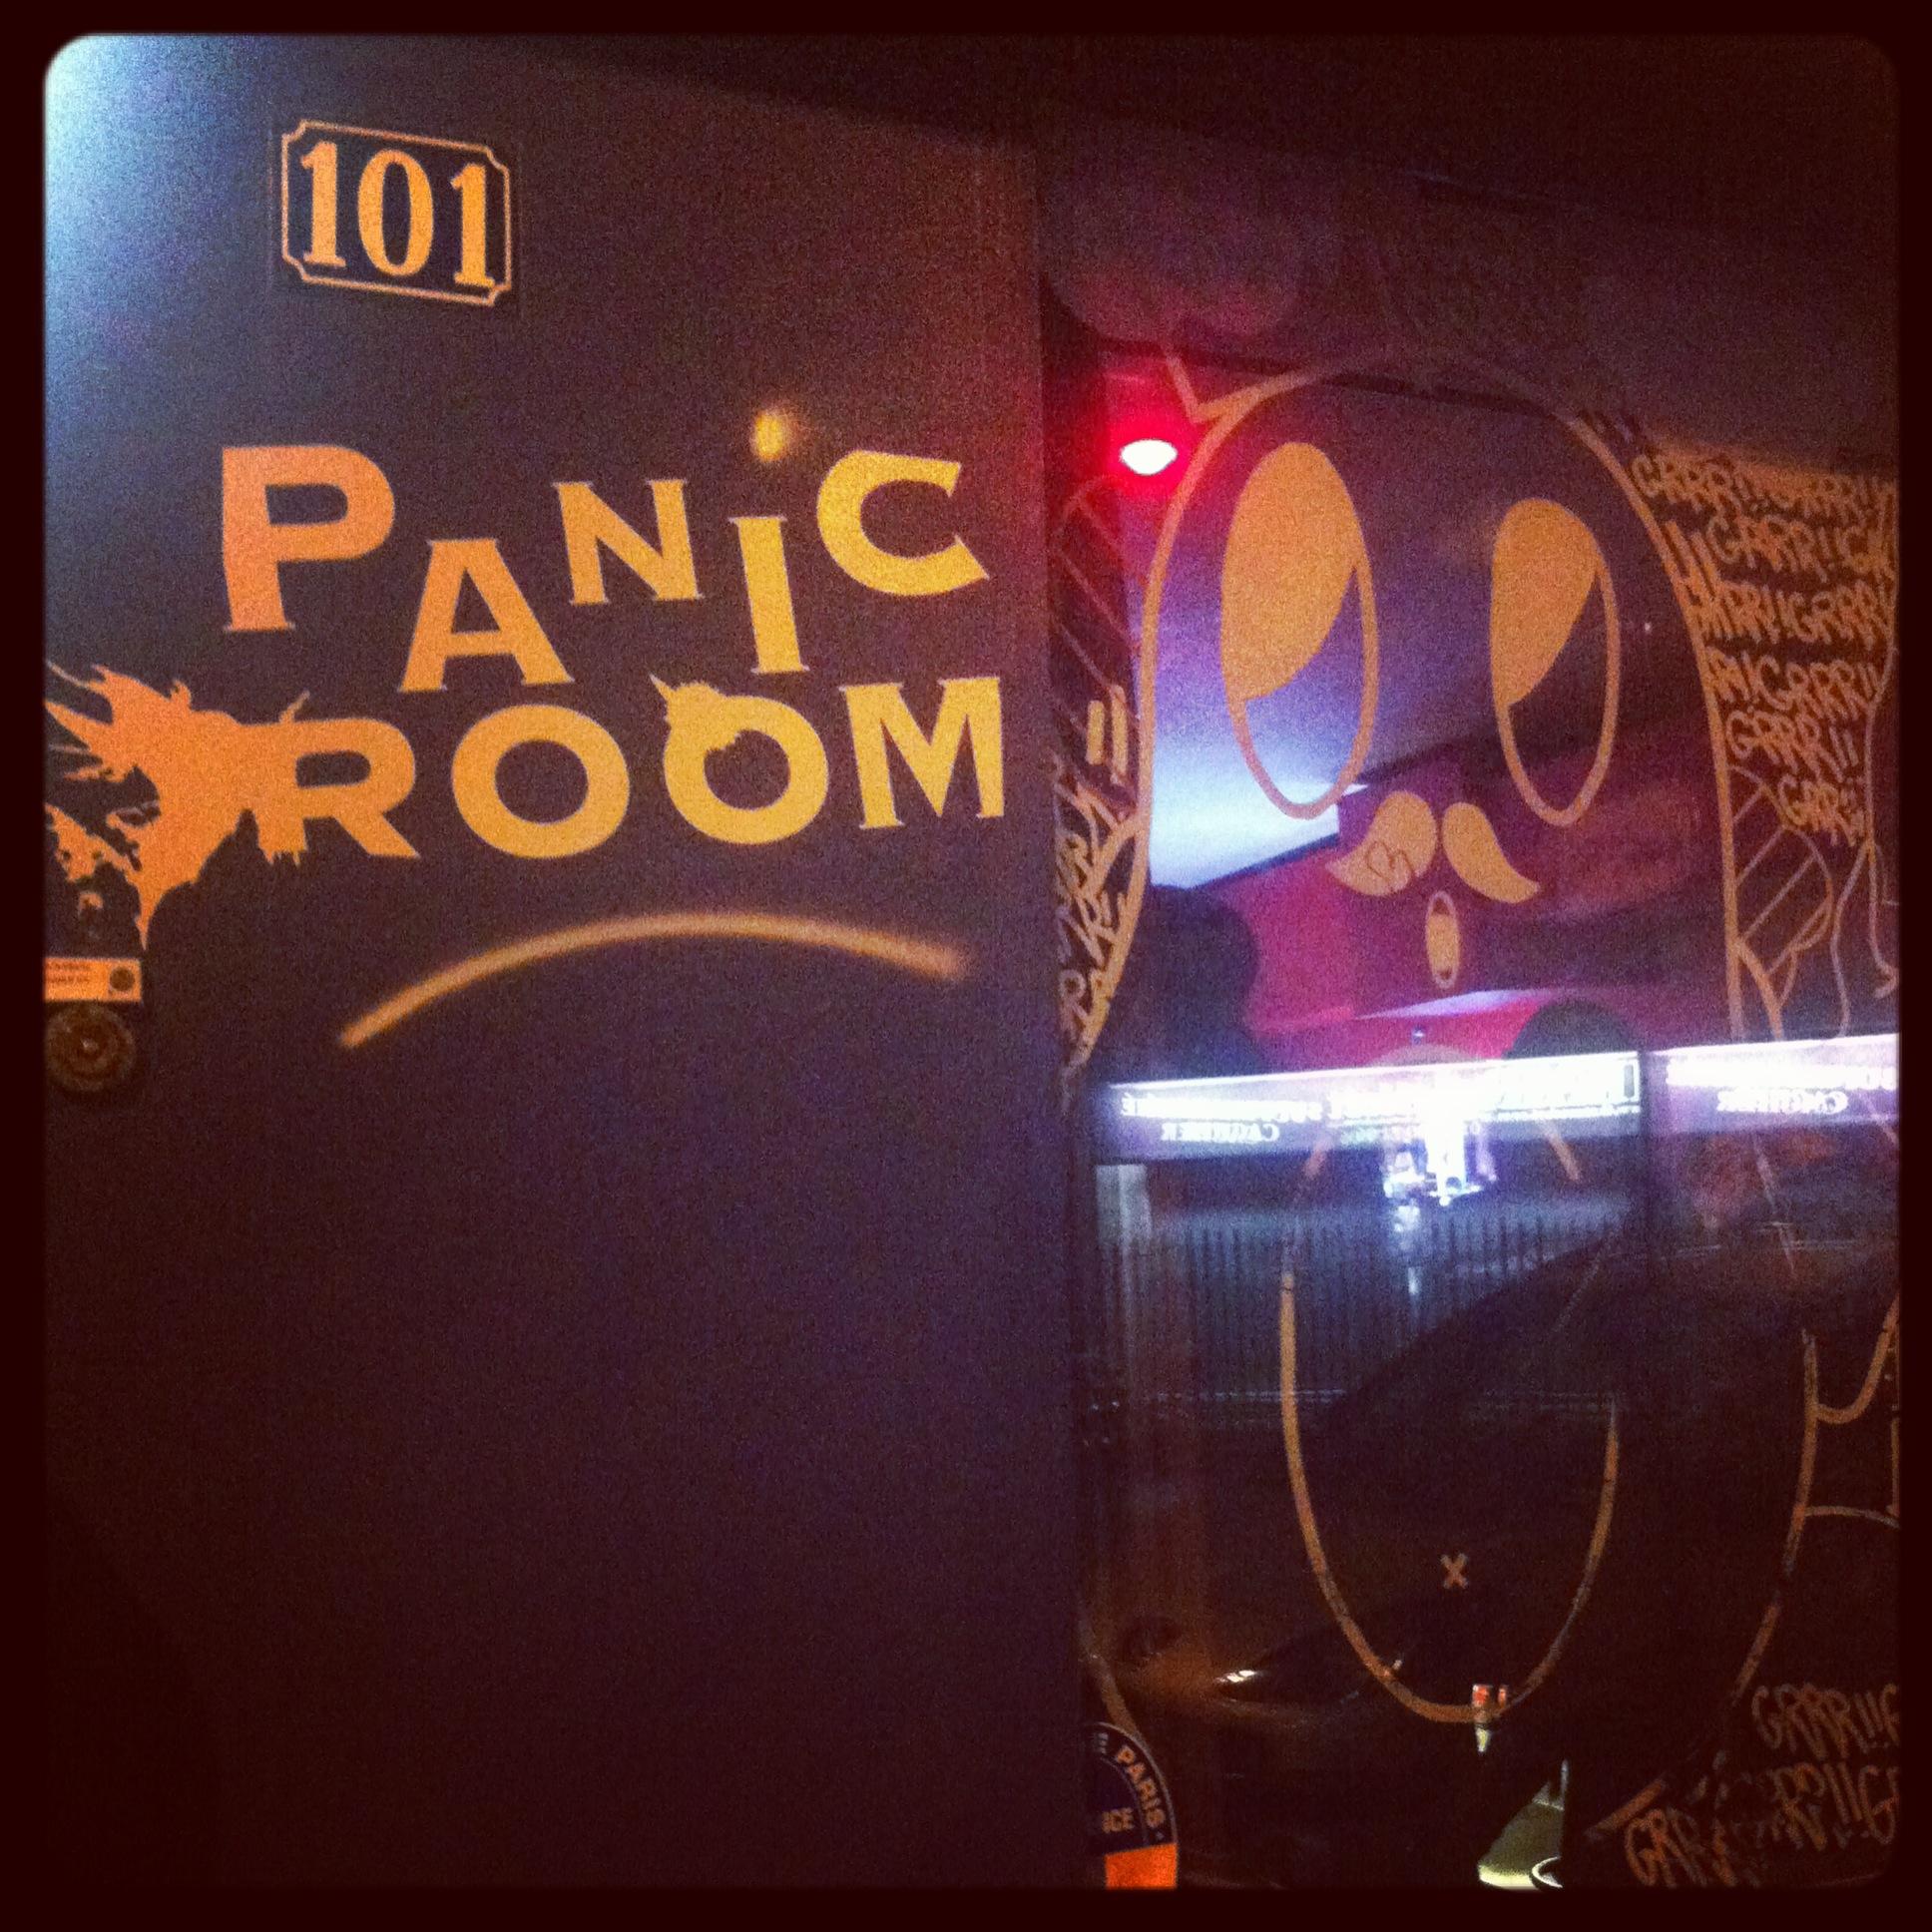 Le Panic Room